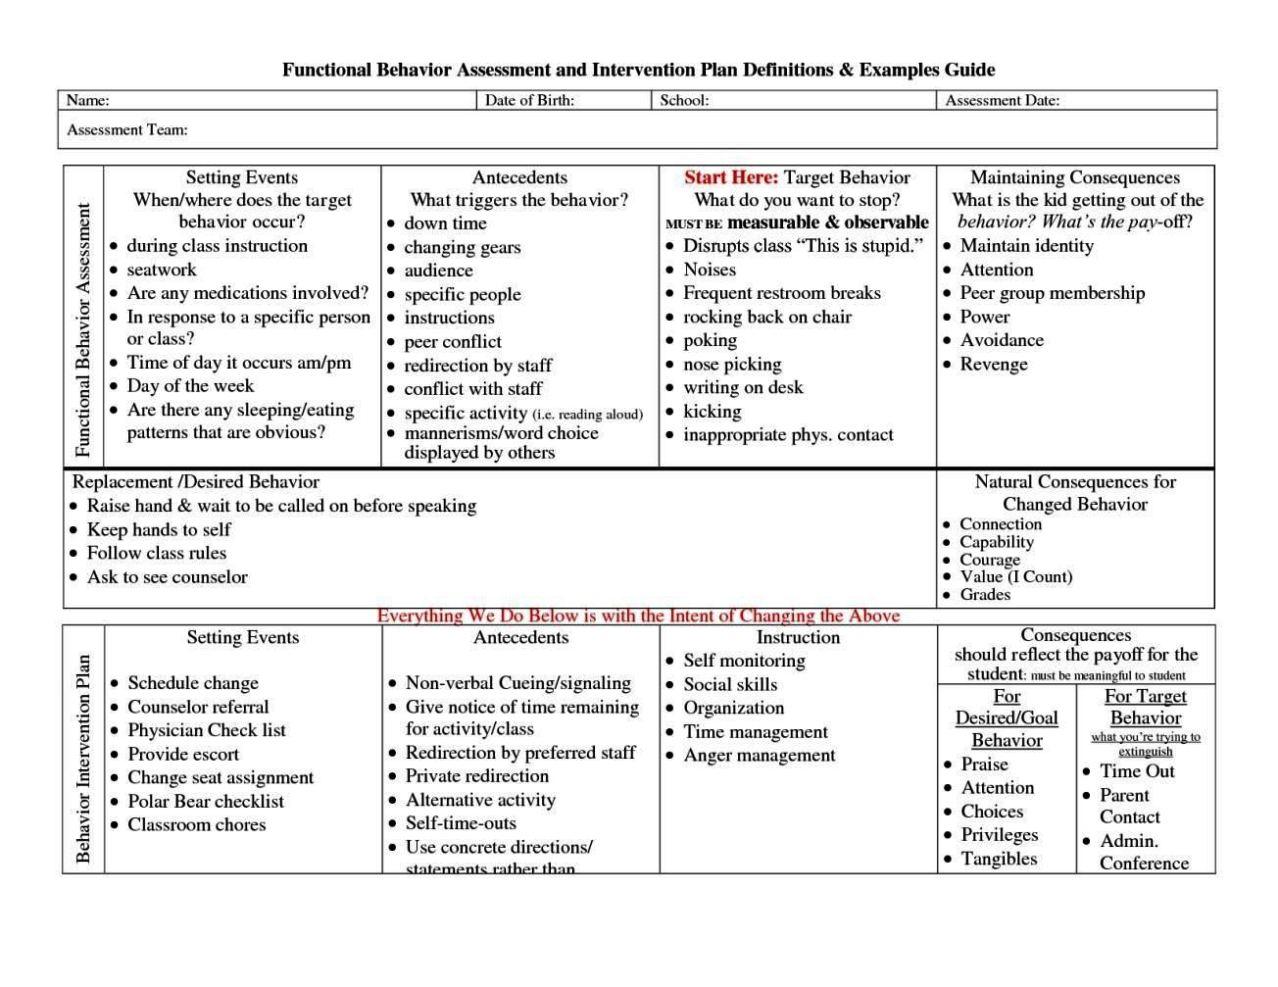 Functional behavior analysis template sampletemplatess functional behavior analysis template maxwellsz